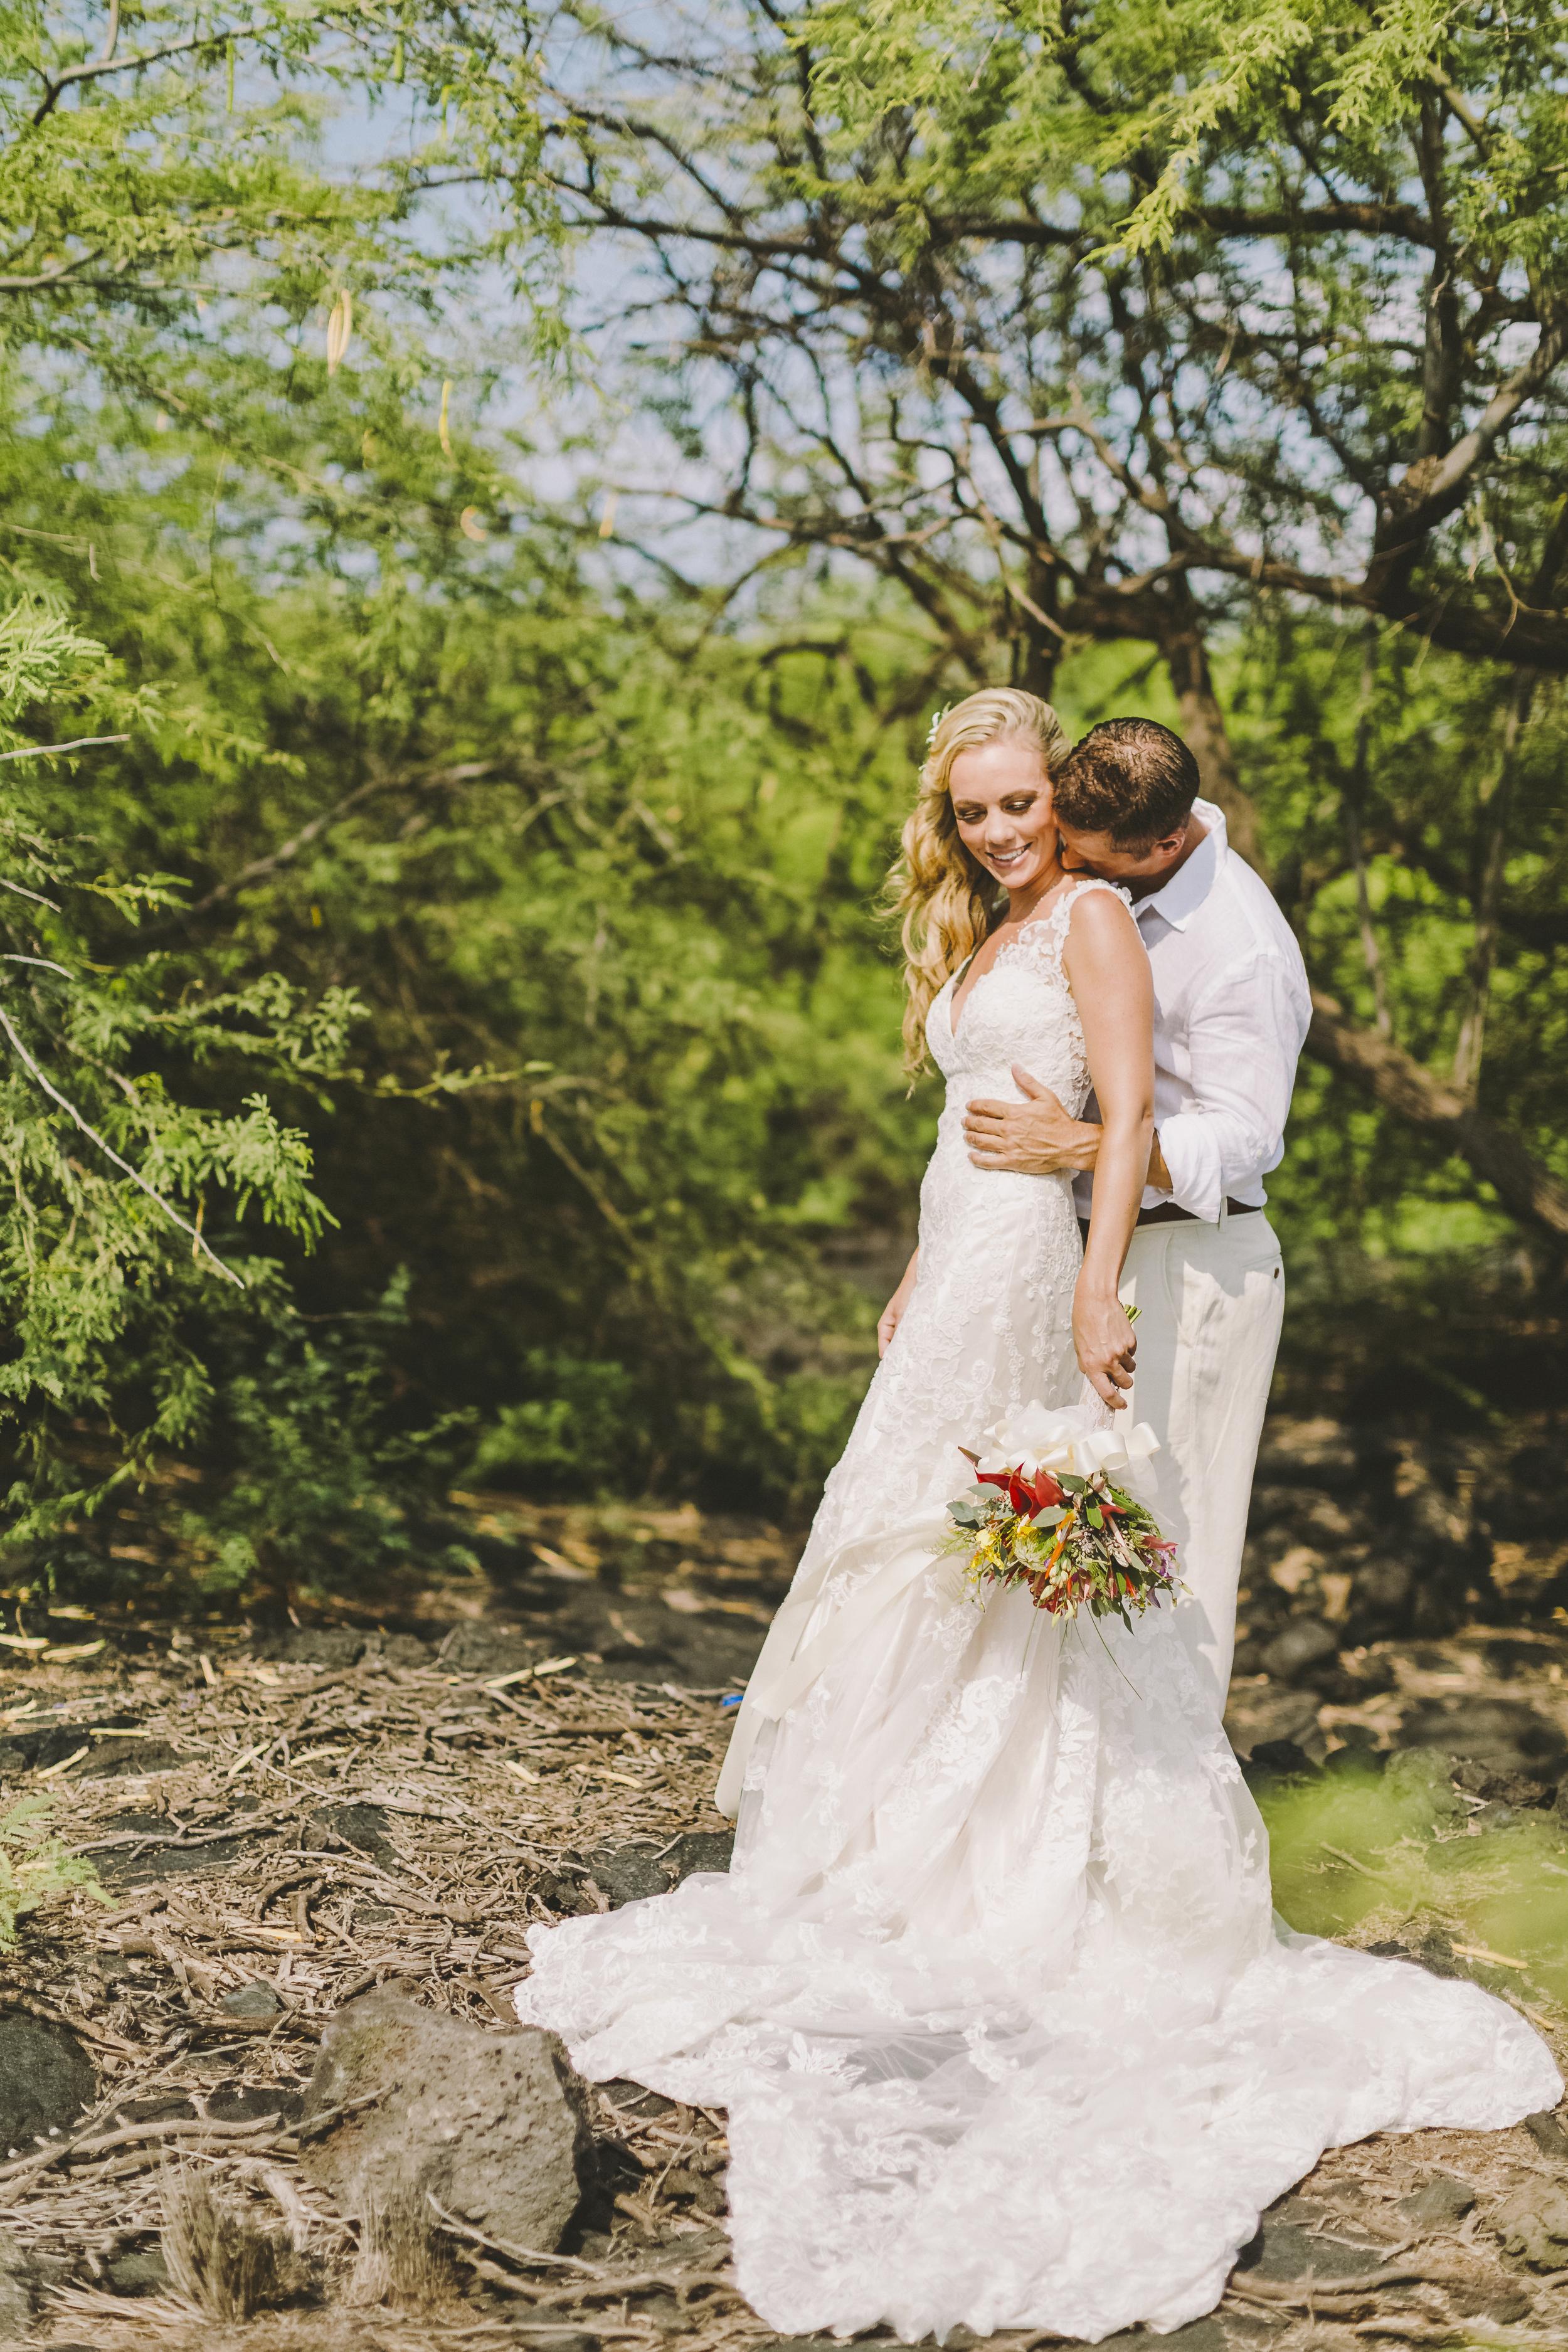 angie-diaz-photography-hawaii-wedding-photographer-kelli-jay-32.jpg